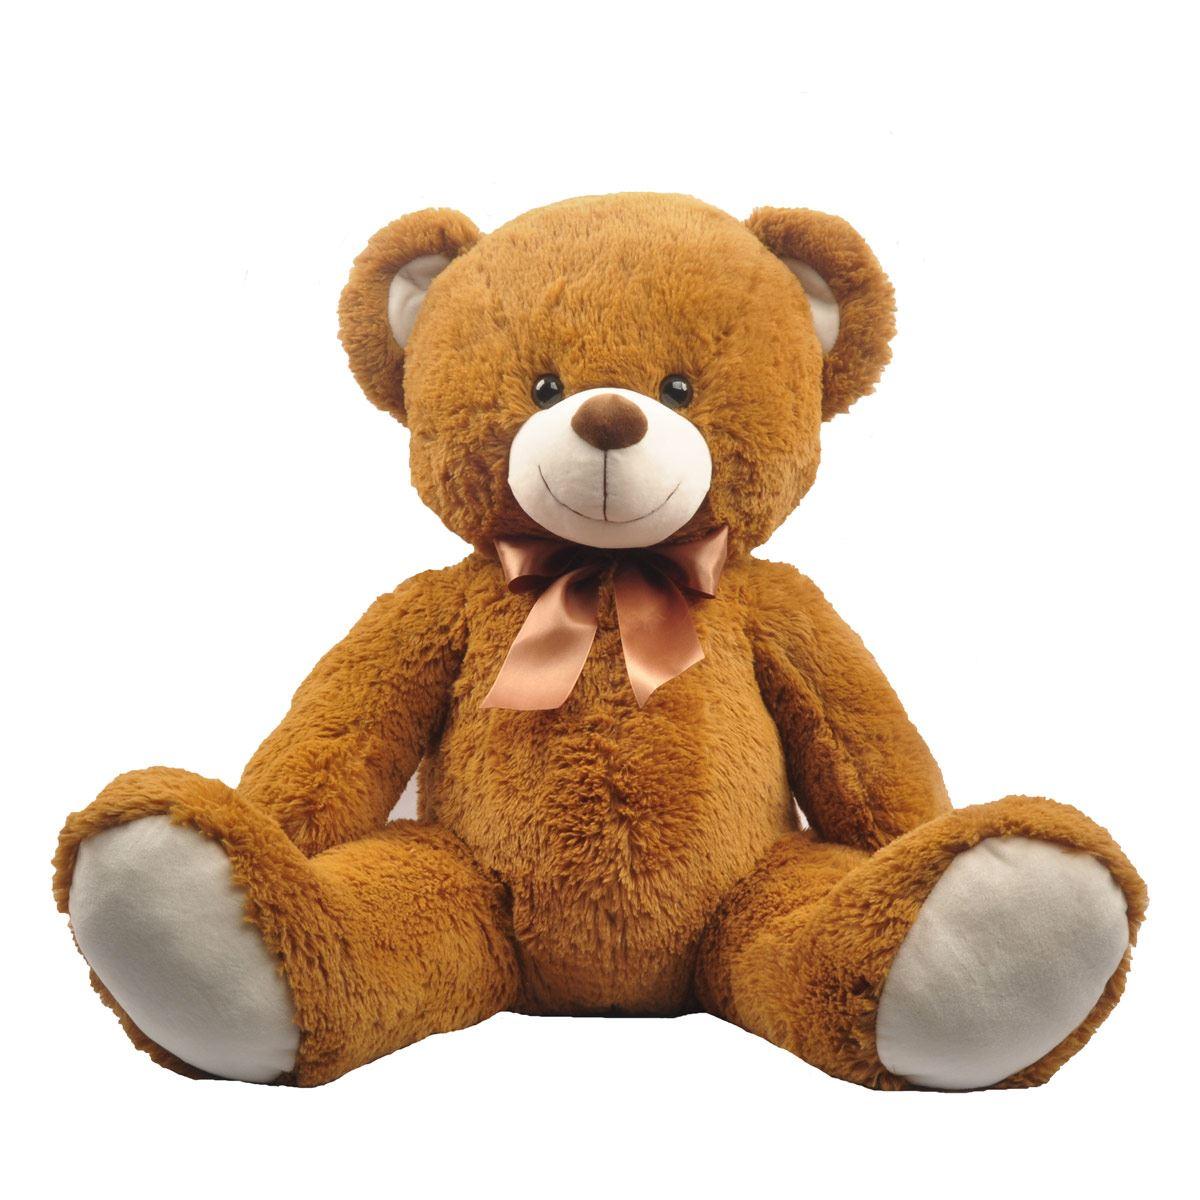 Osito de Peluche Ted Teddy Bear